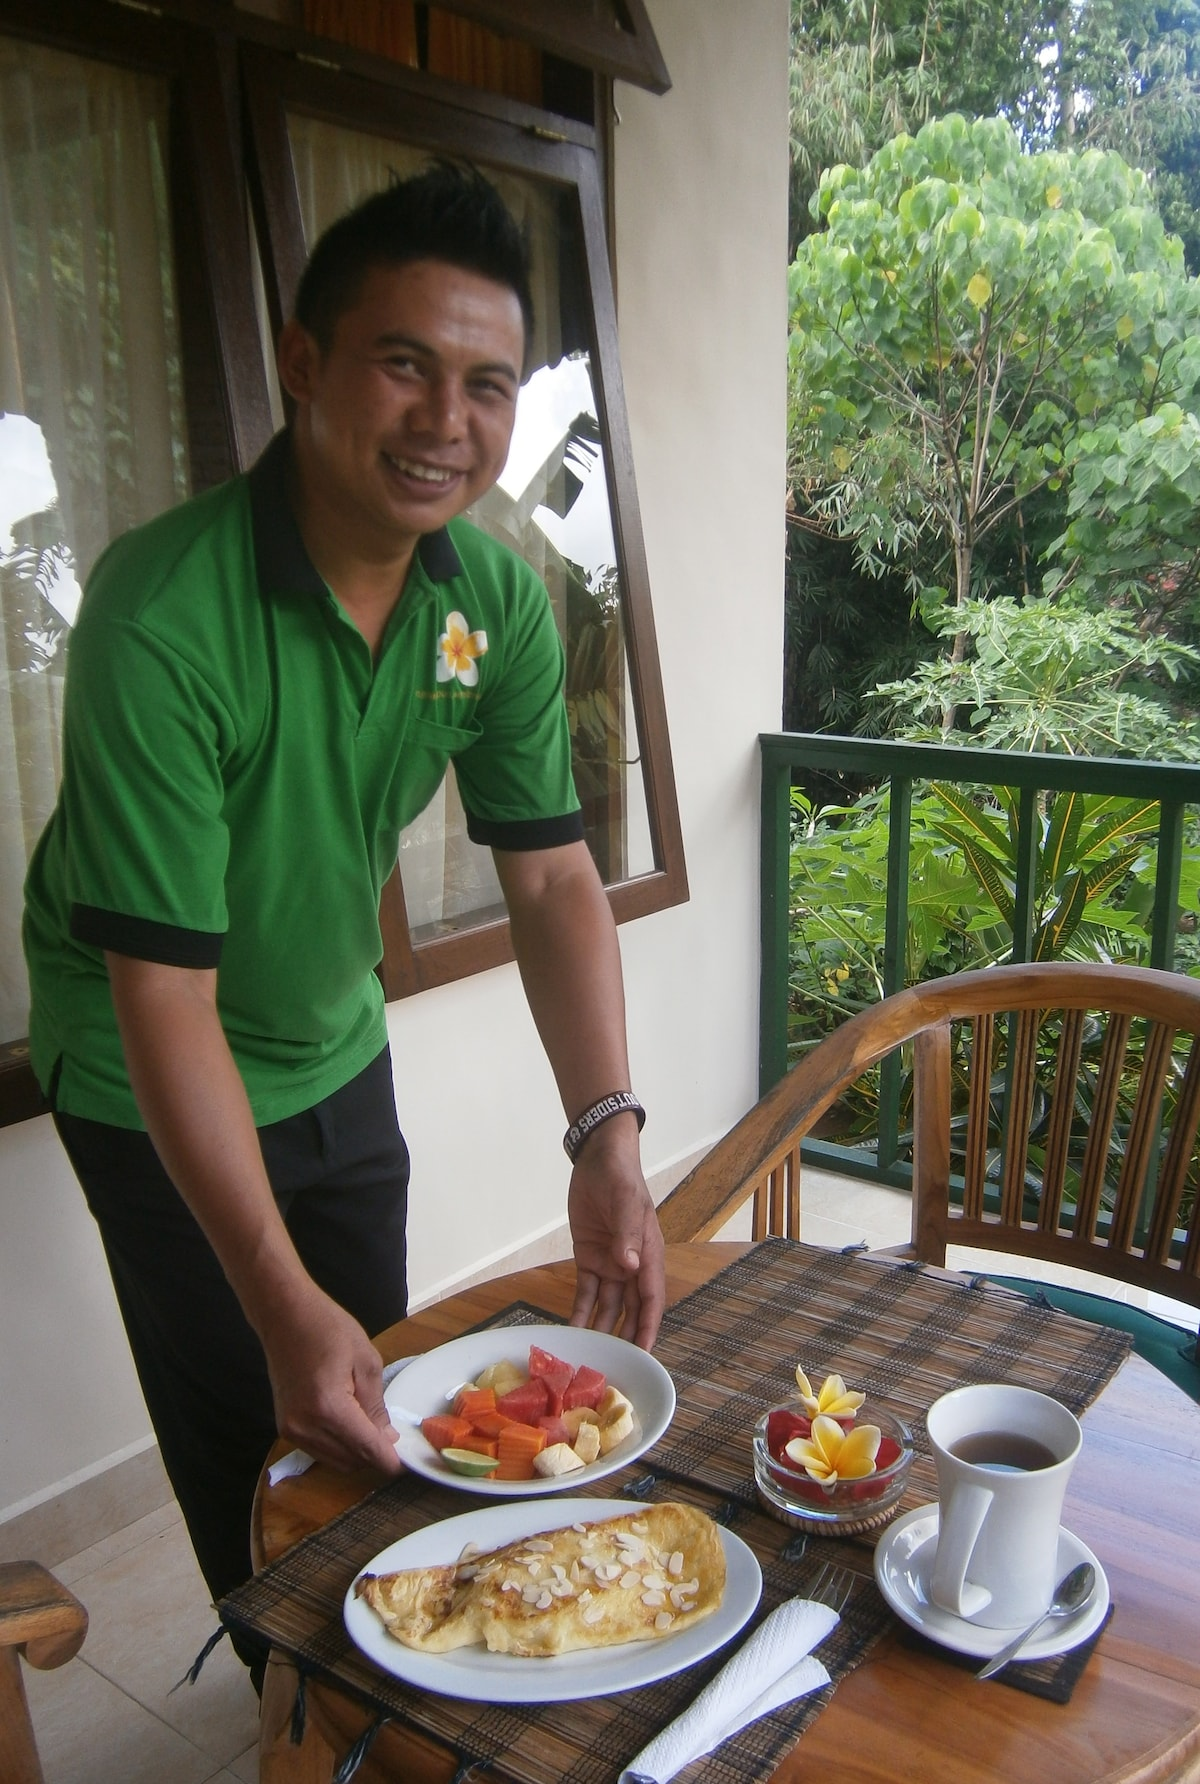 Breakfast on your balcony - Gede makes a fabulous banana pancake